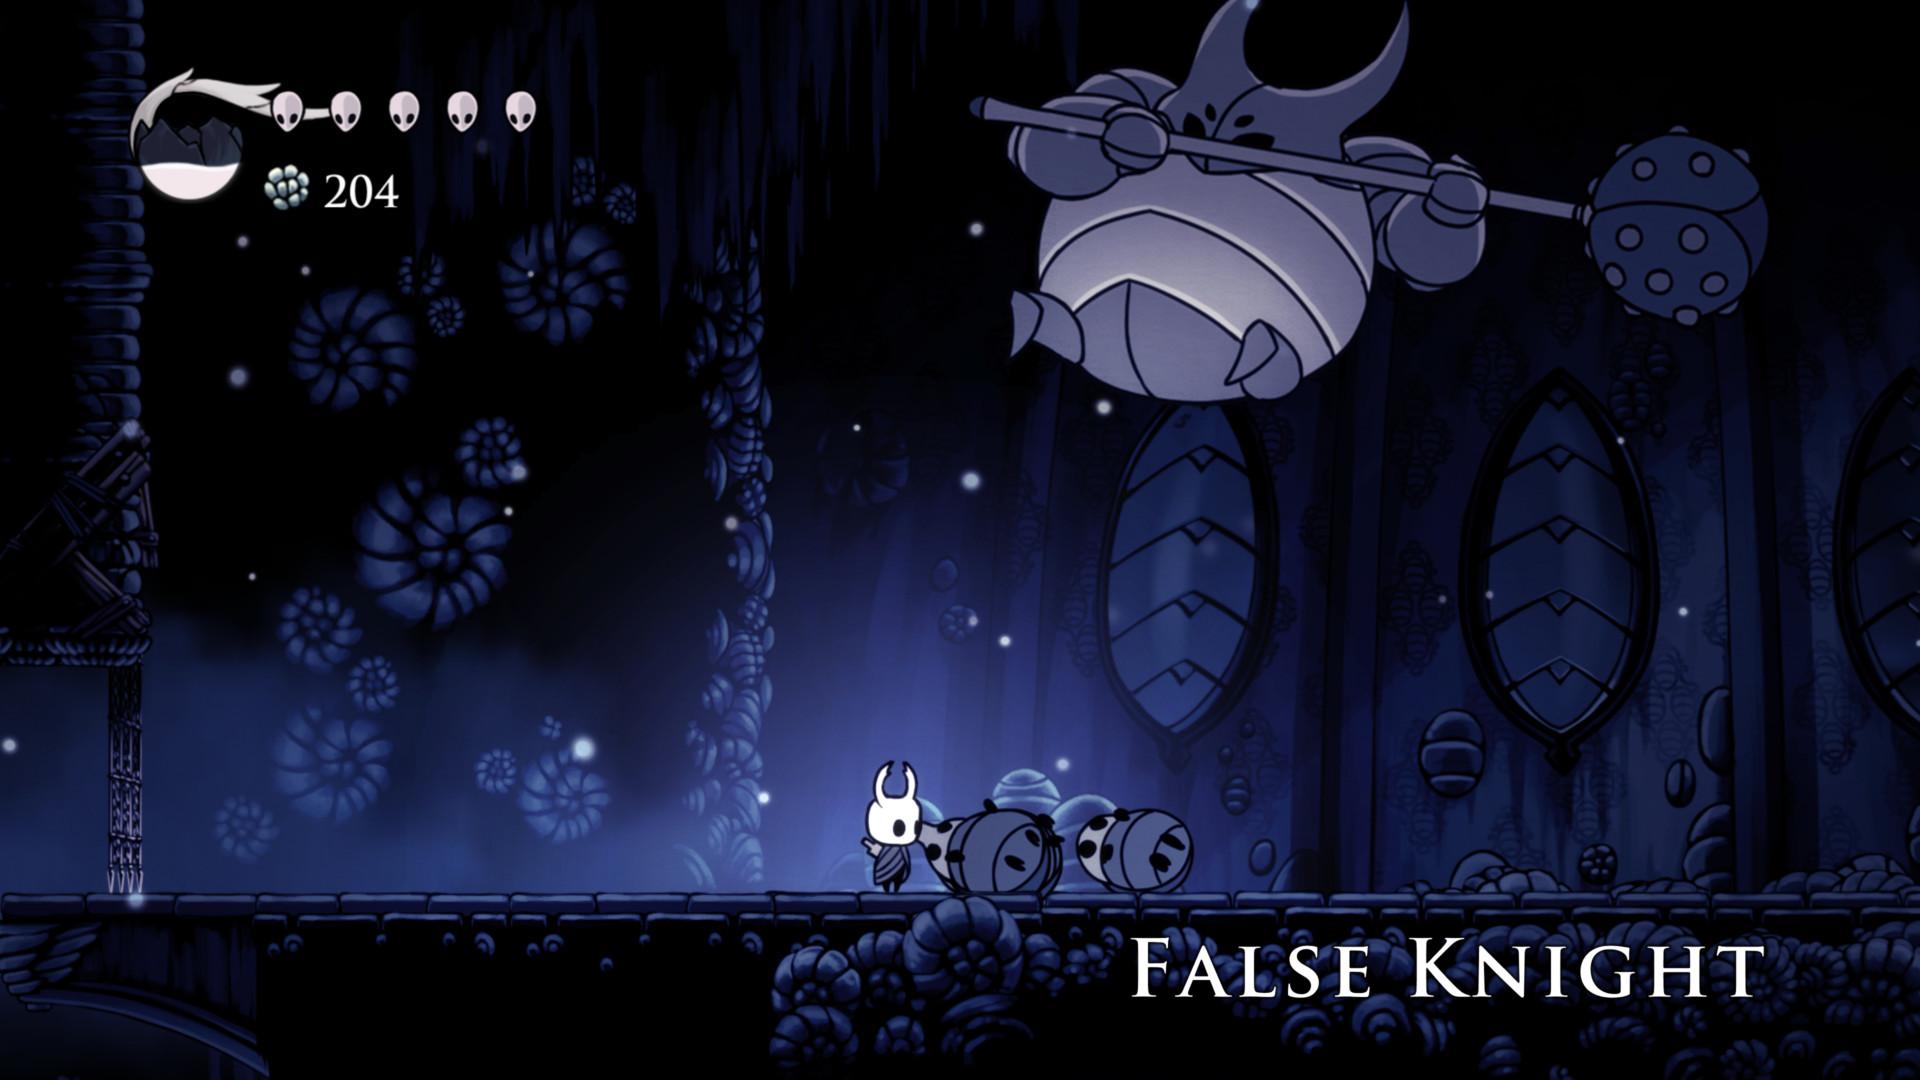 Boss screenshot of Hollow Knight video game interface.